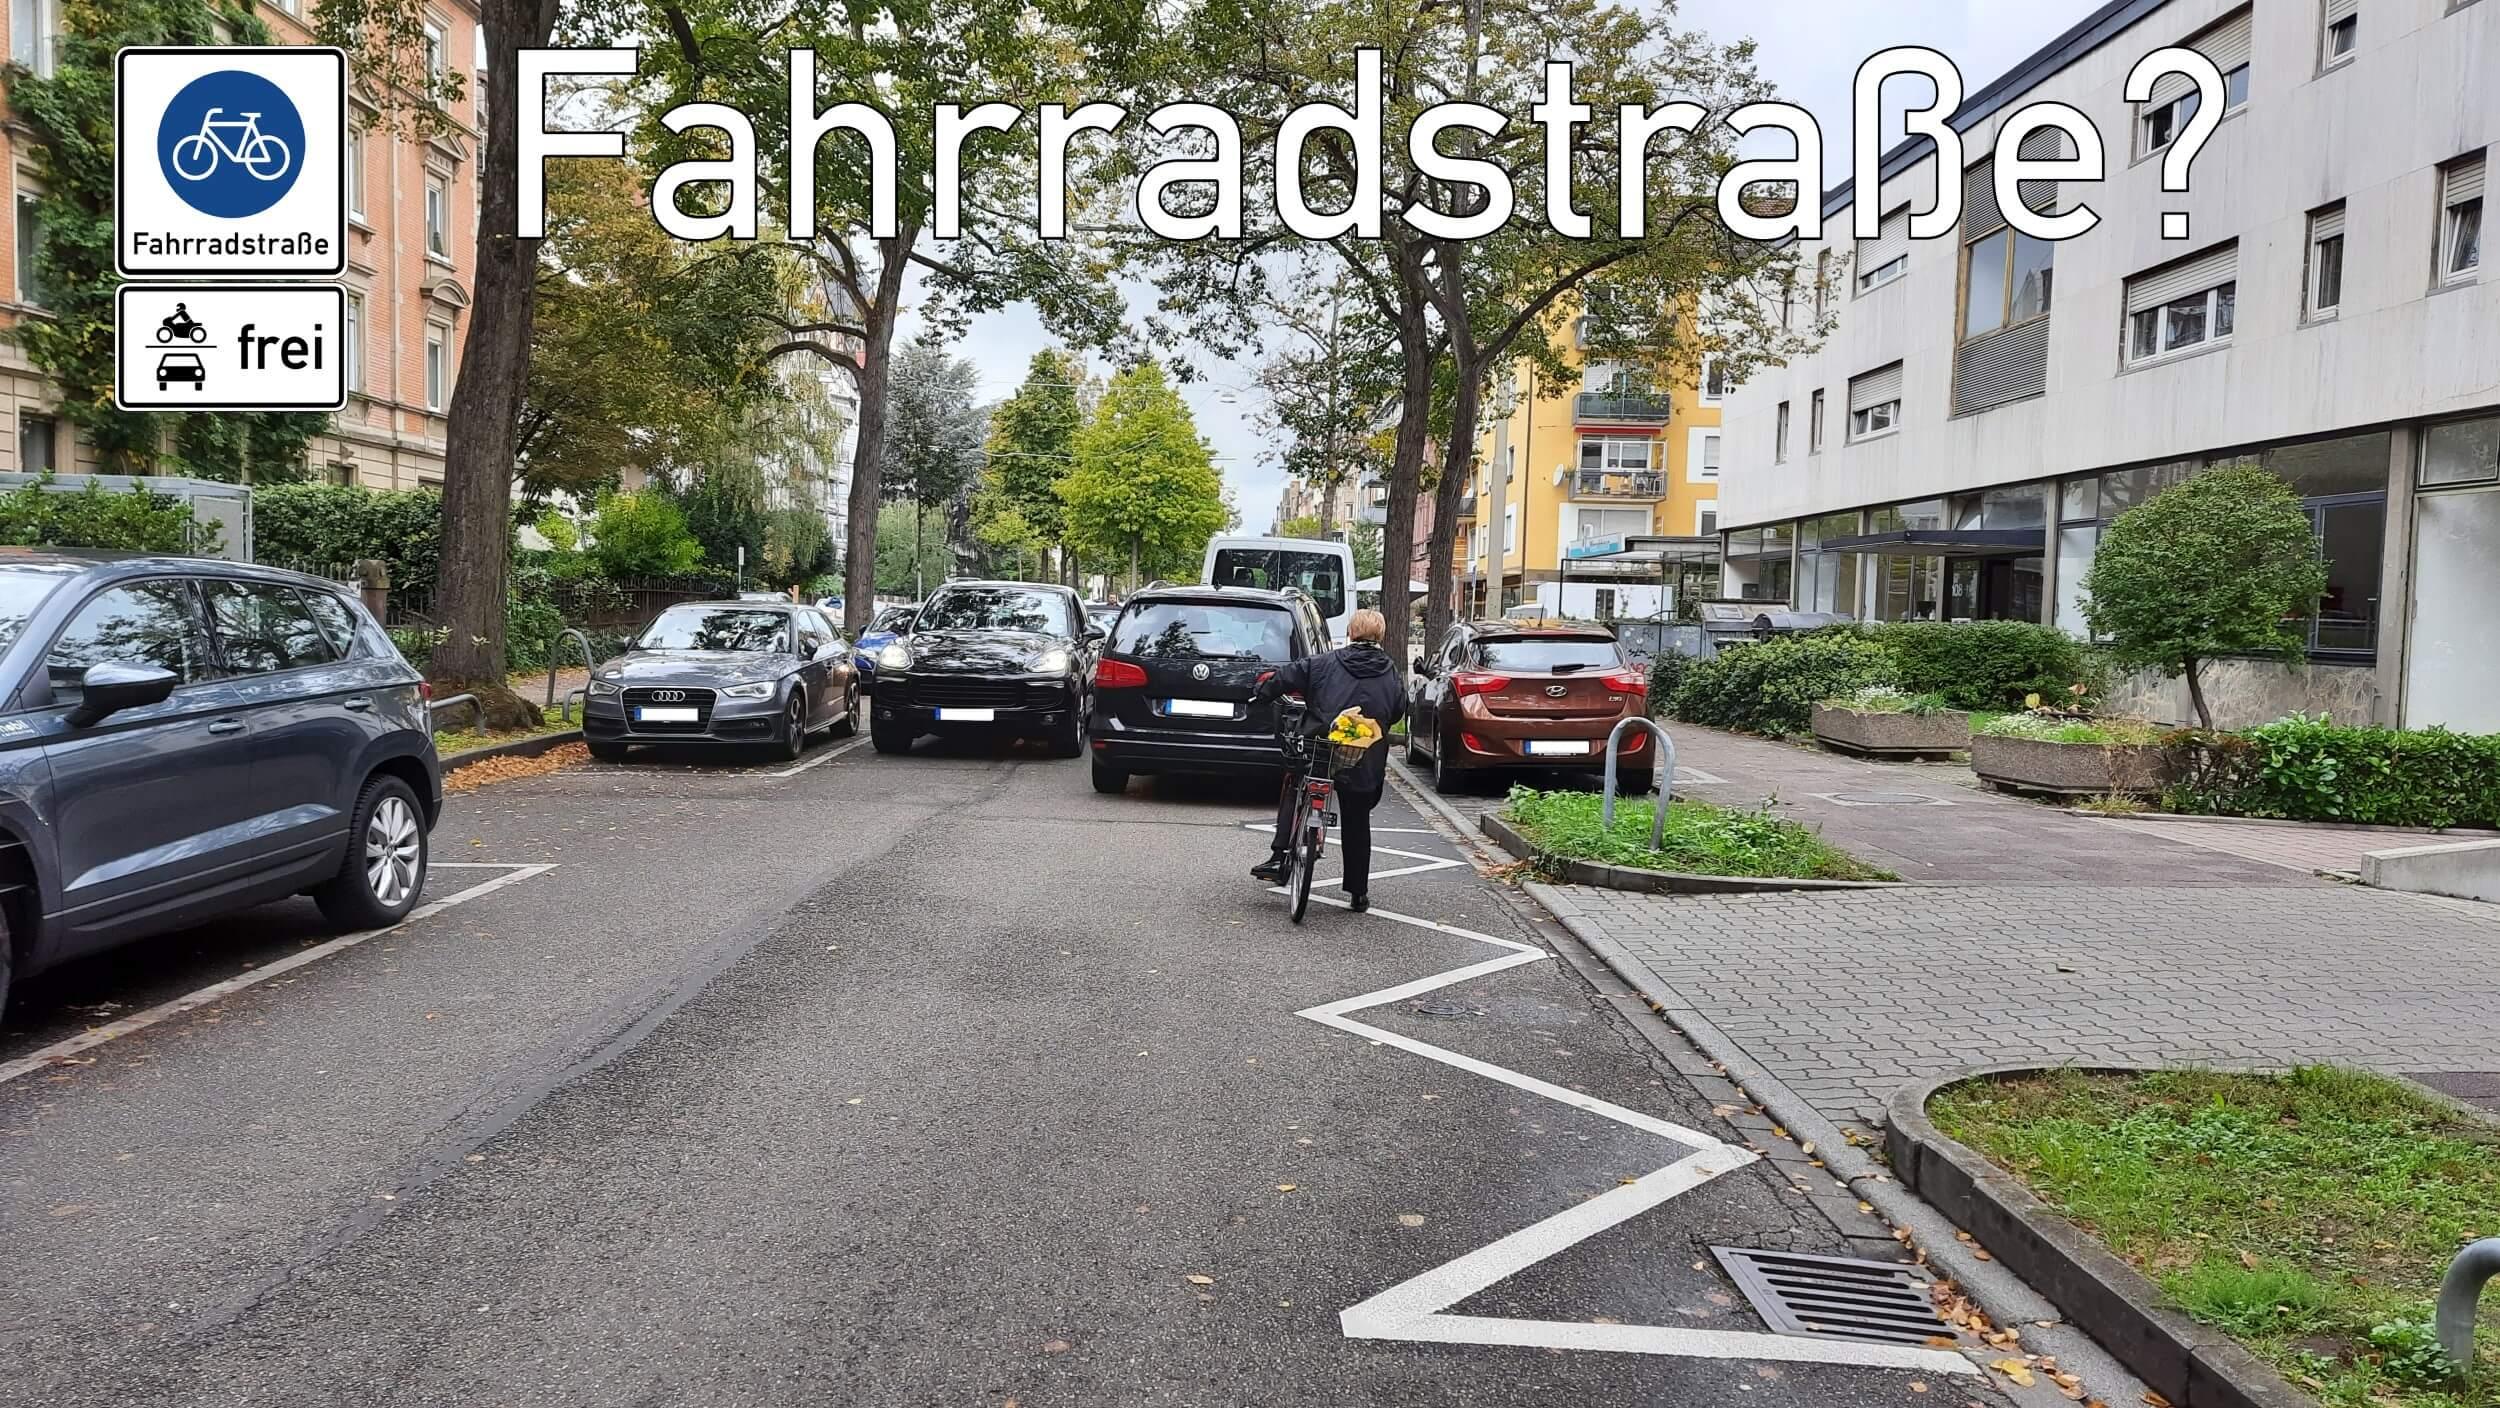 Fahrradstadt Karlsruhe?